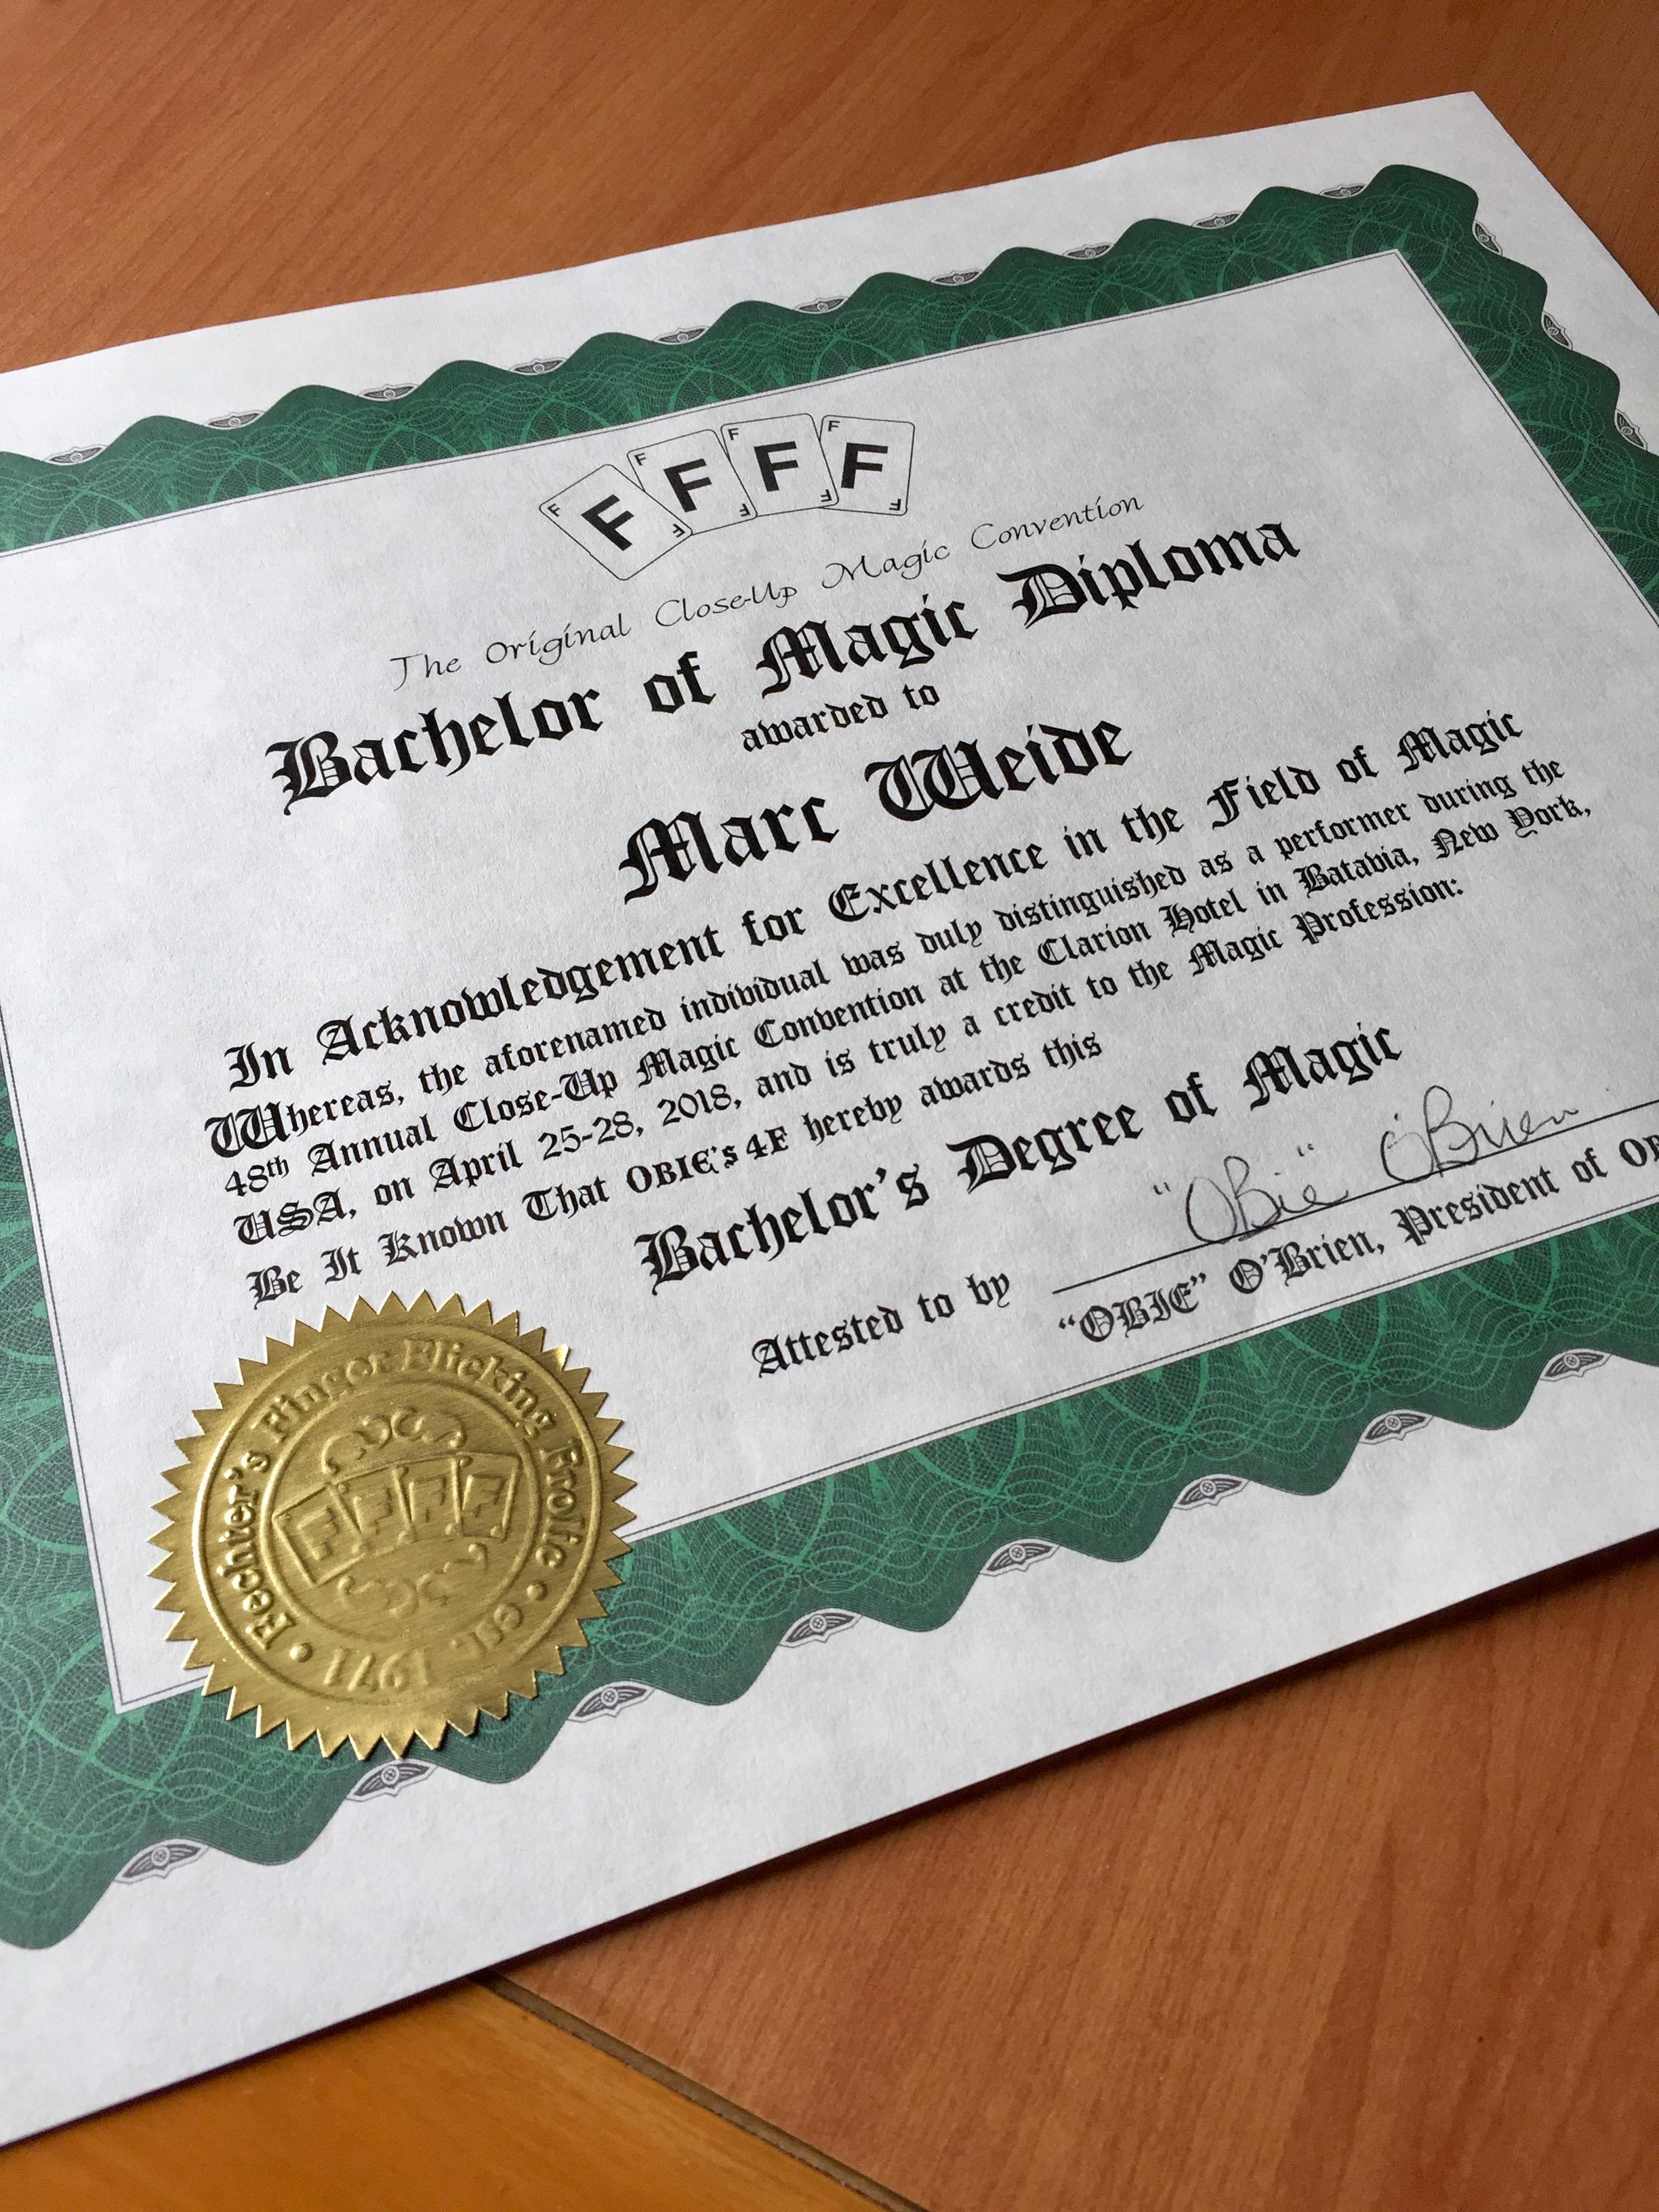 Bachelor Of Magic Das Hogwarts Des 21 Jahrhunderts Marc Weide